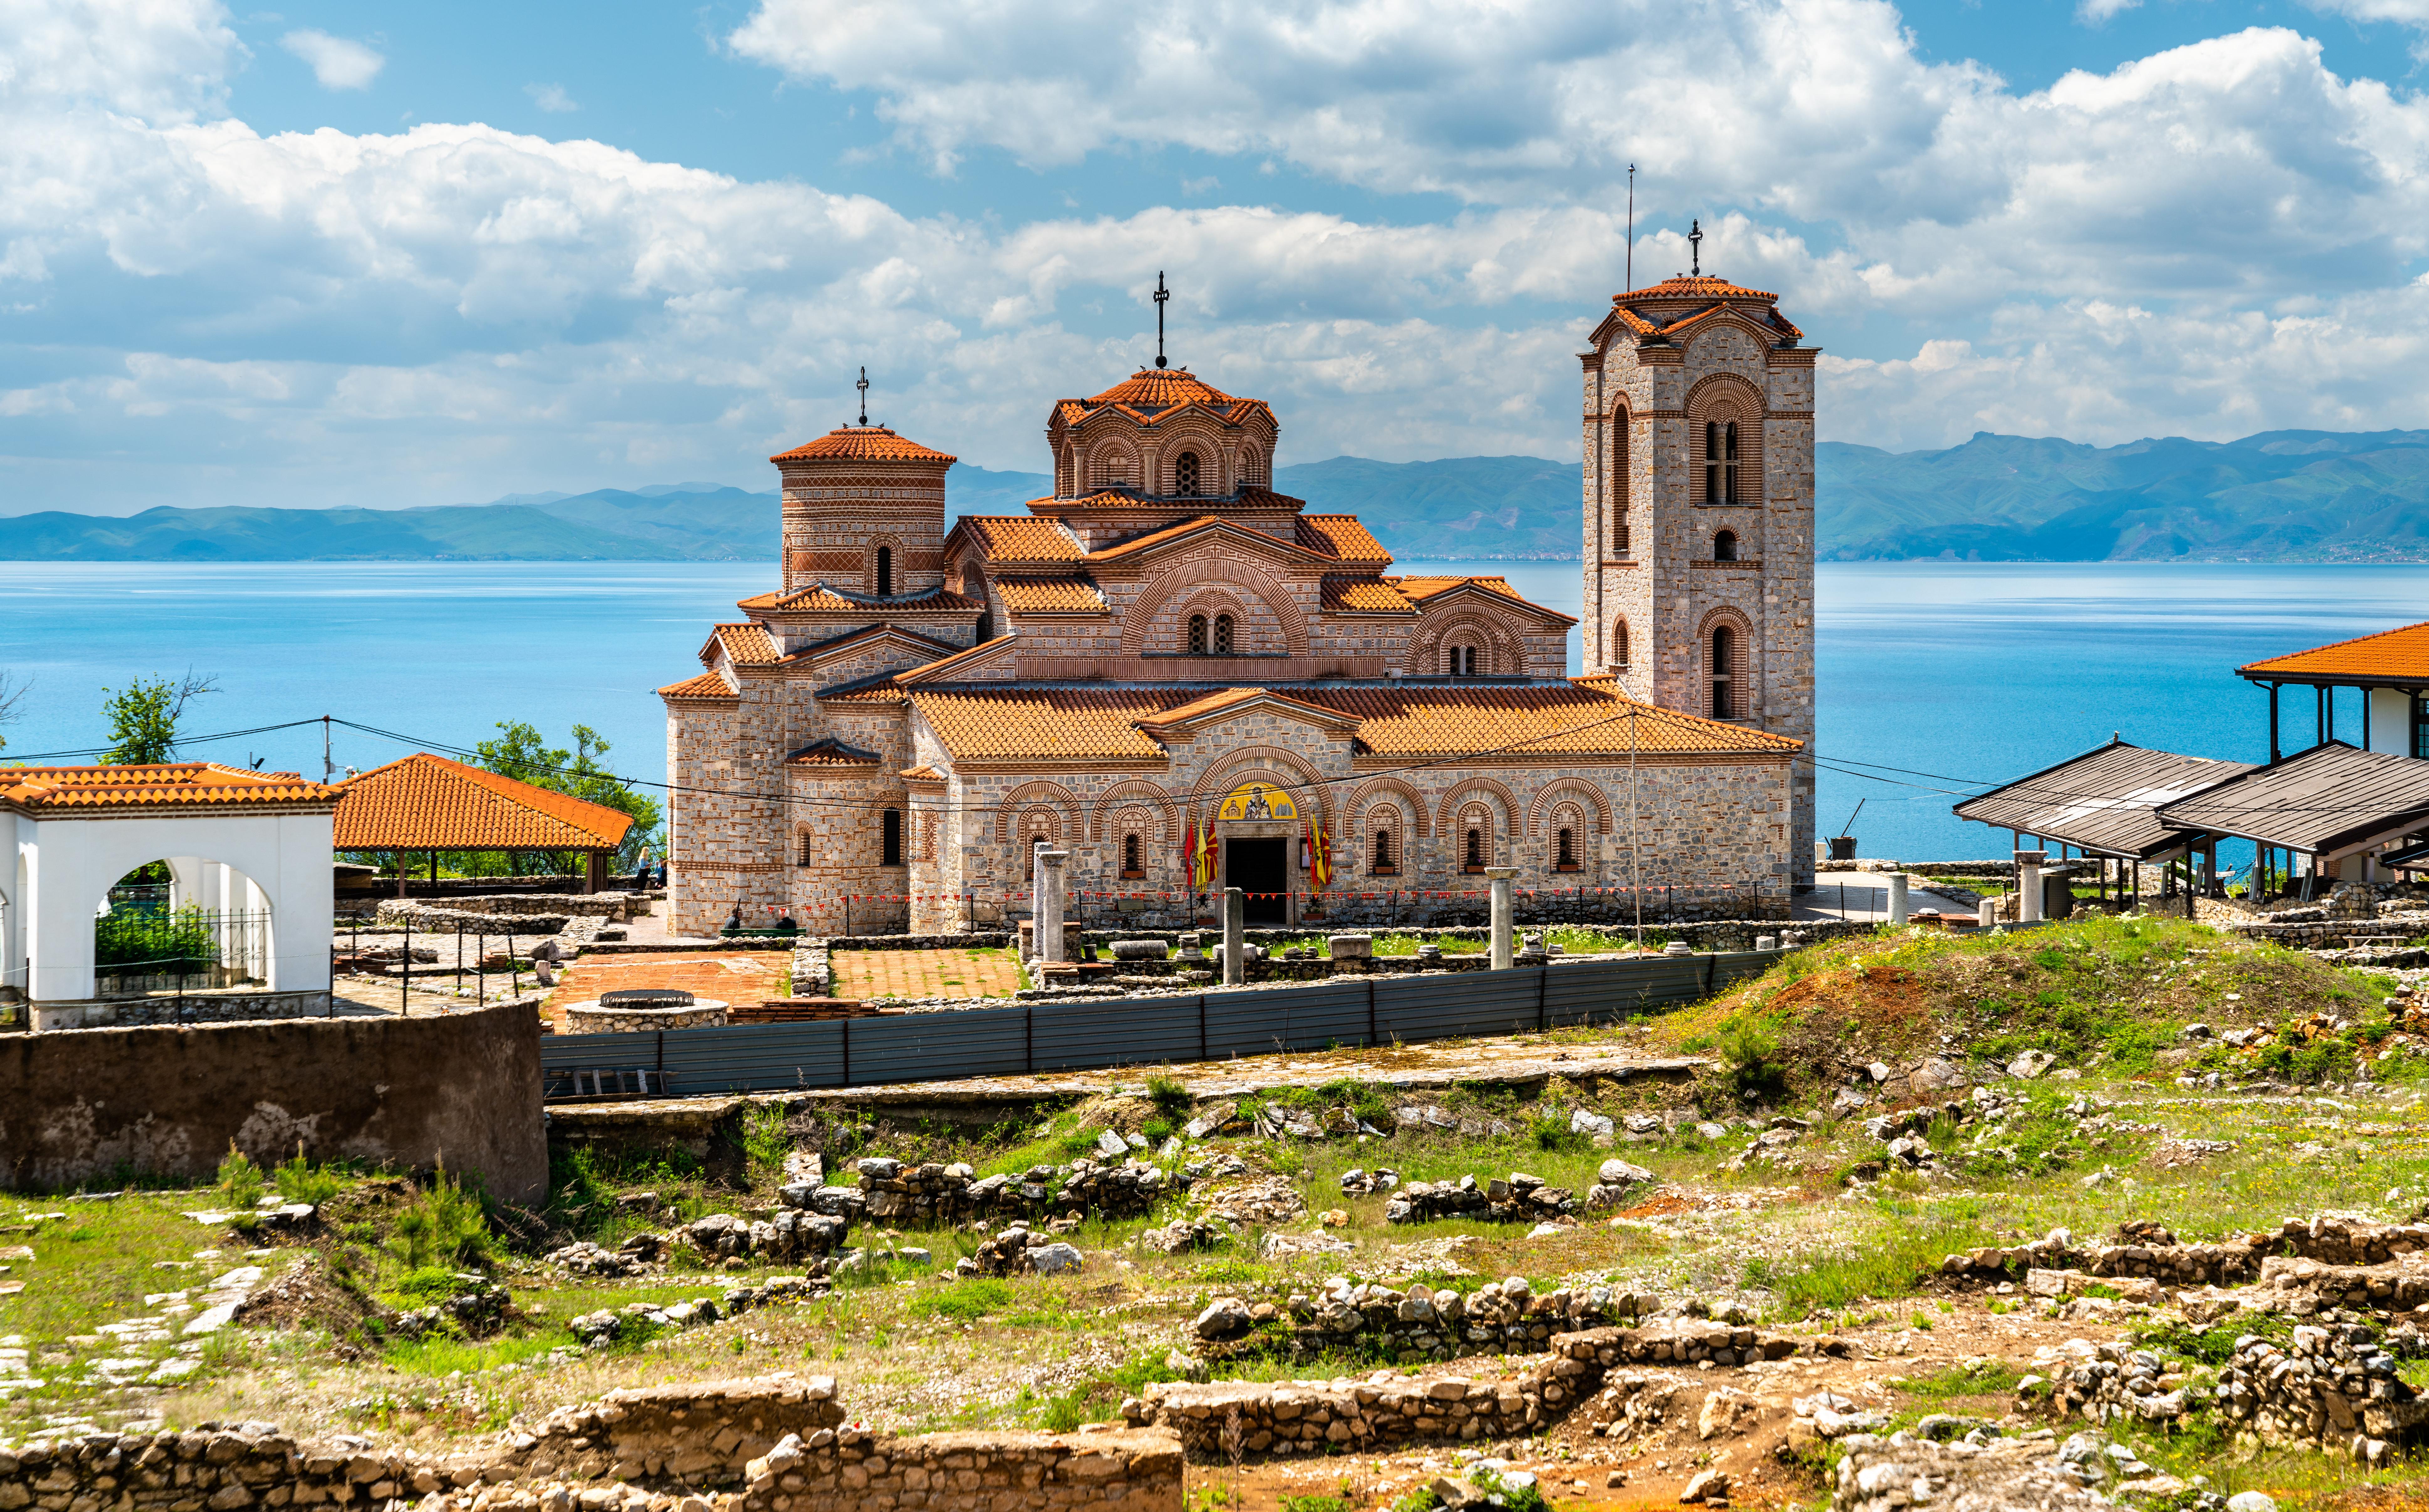 Saints Clement and Panteleimon Church at Plaosnik in Ohrid, North Macedonia